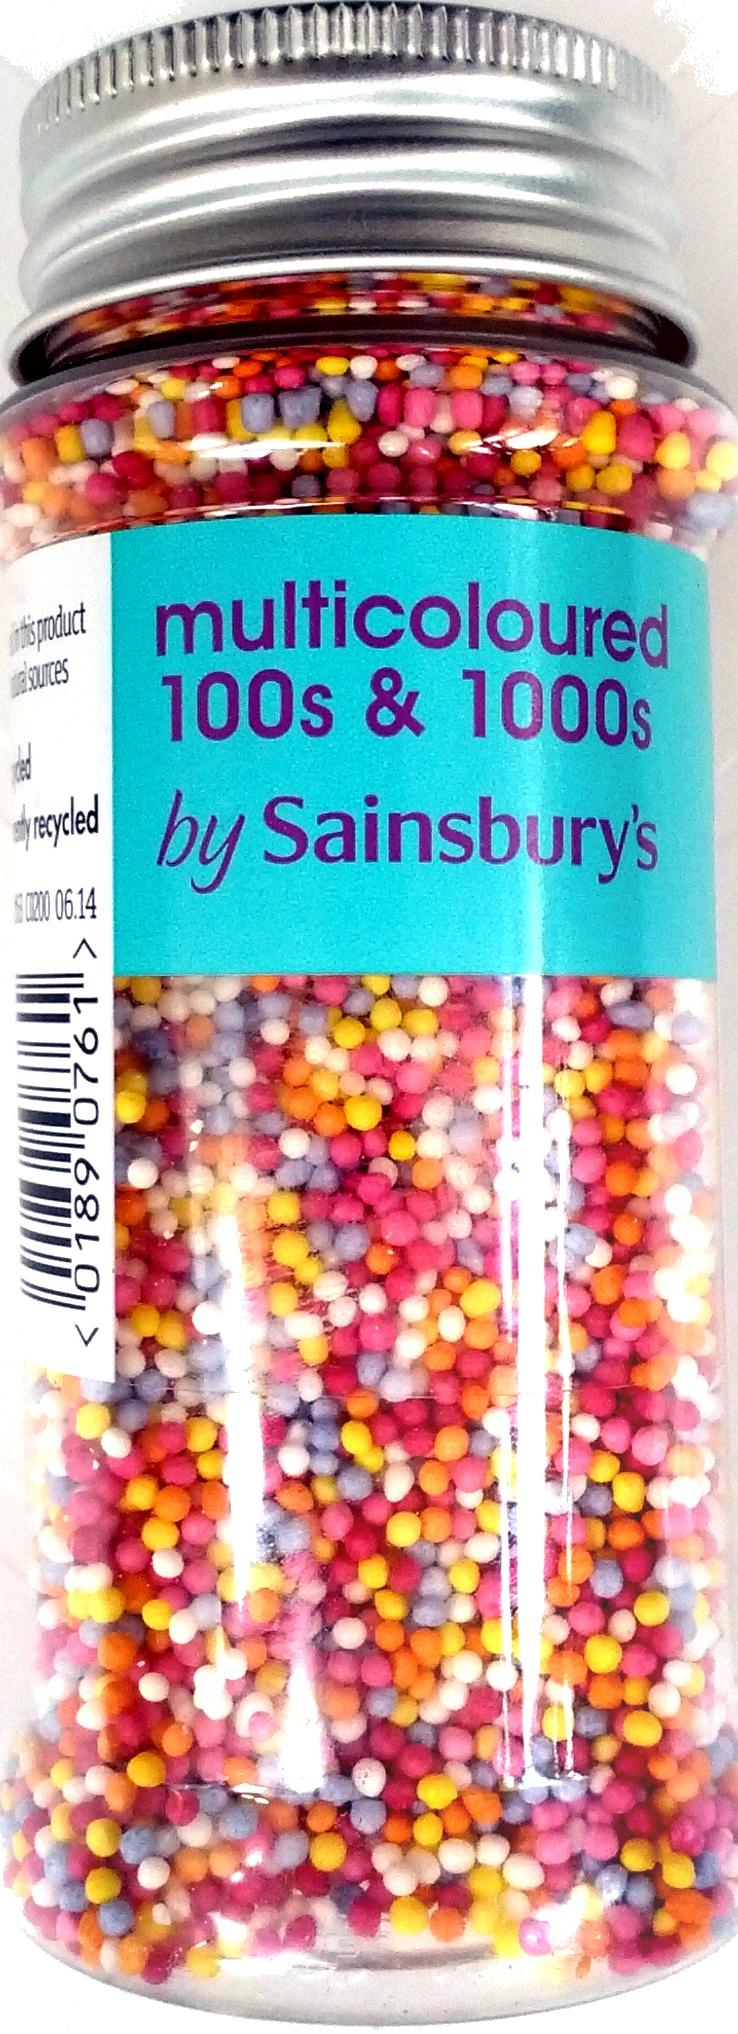 Multicoloured 100s & 1000s - Produit - en